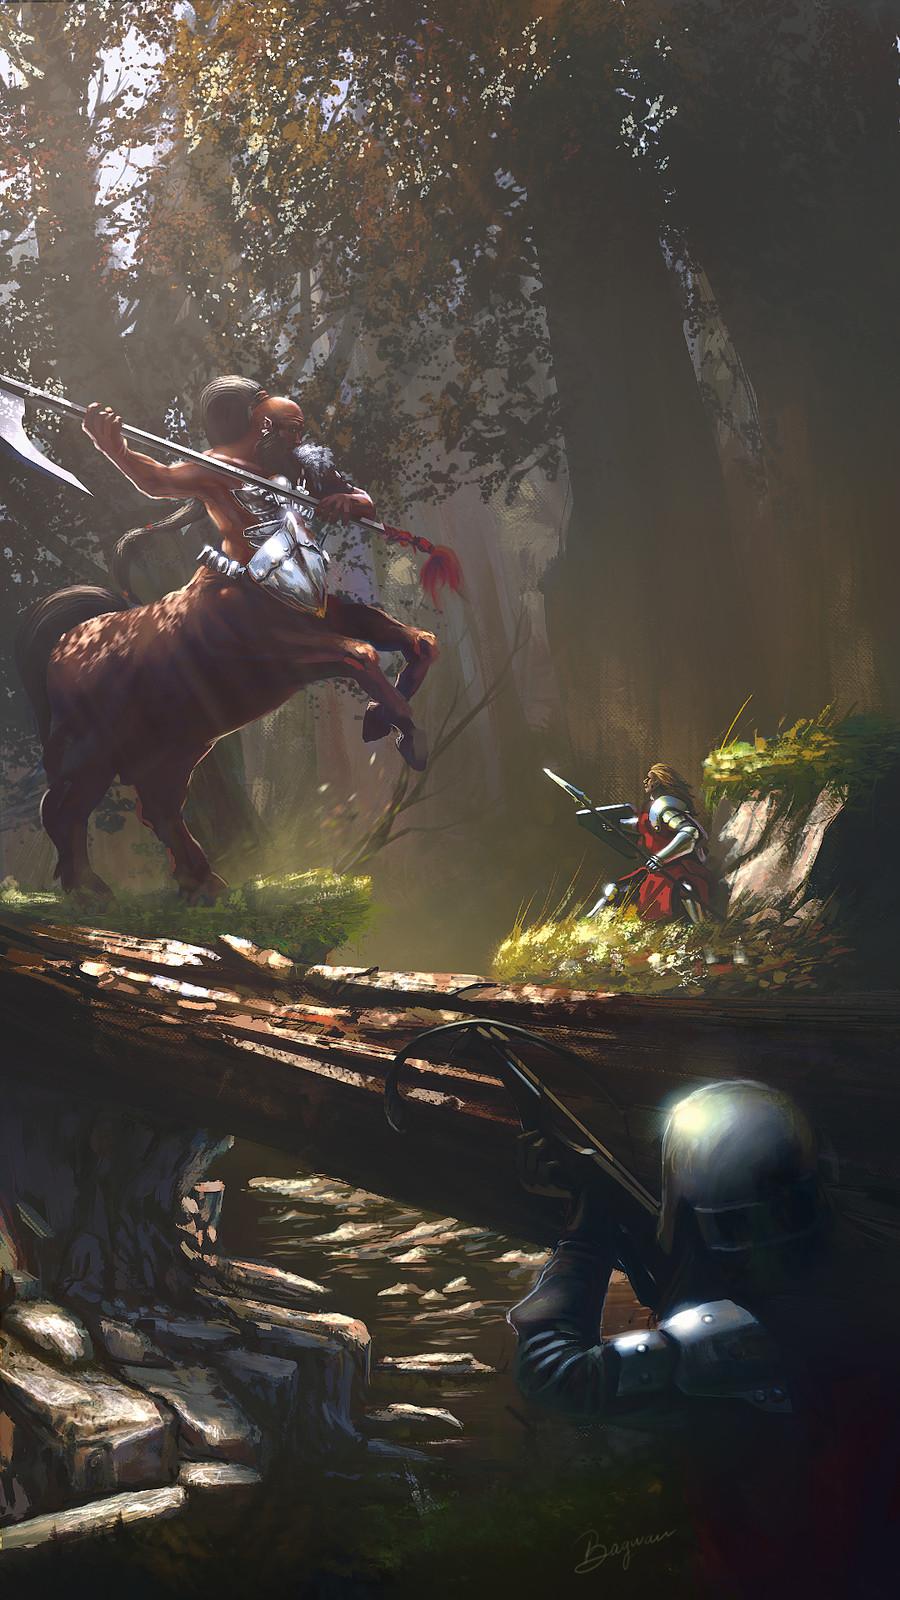 centaur hunting